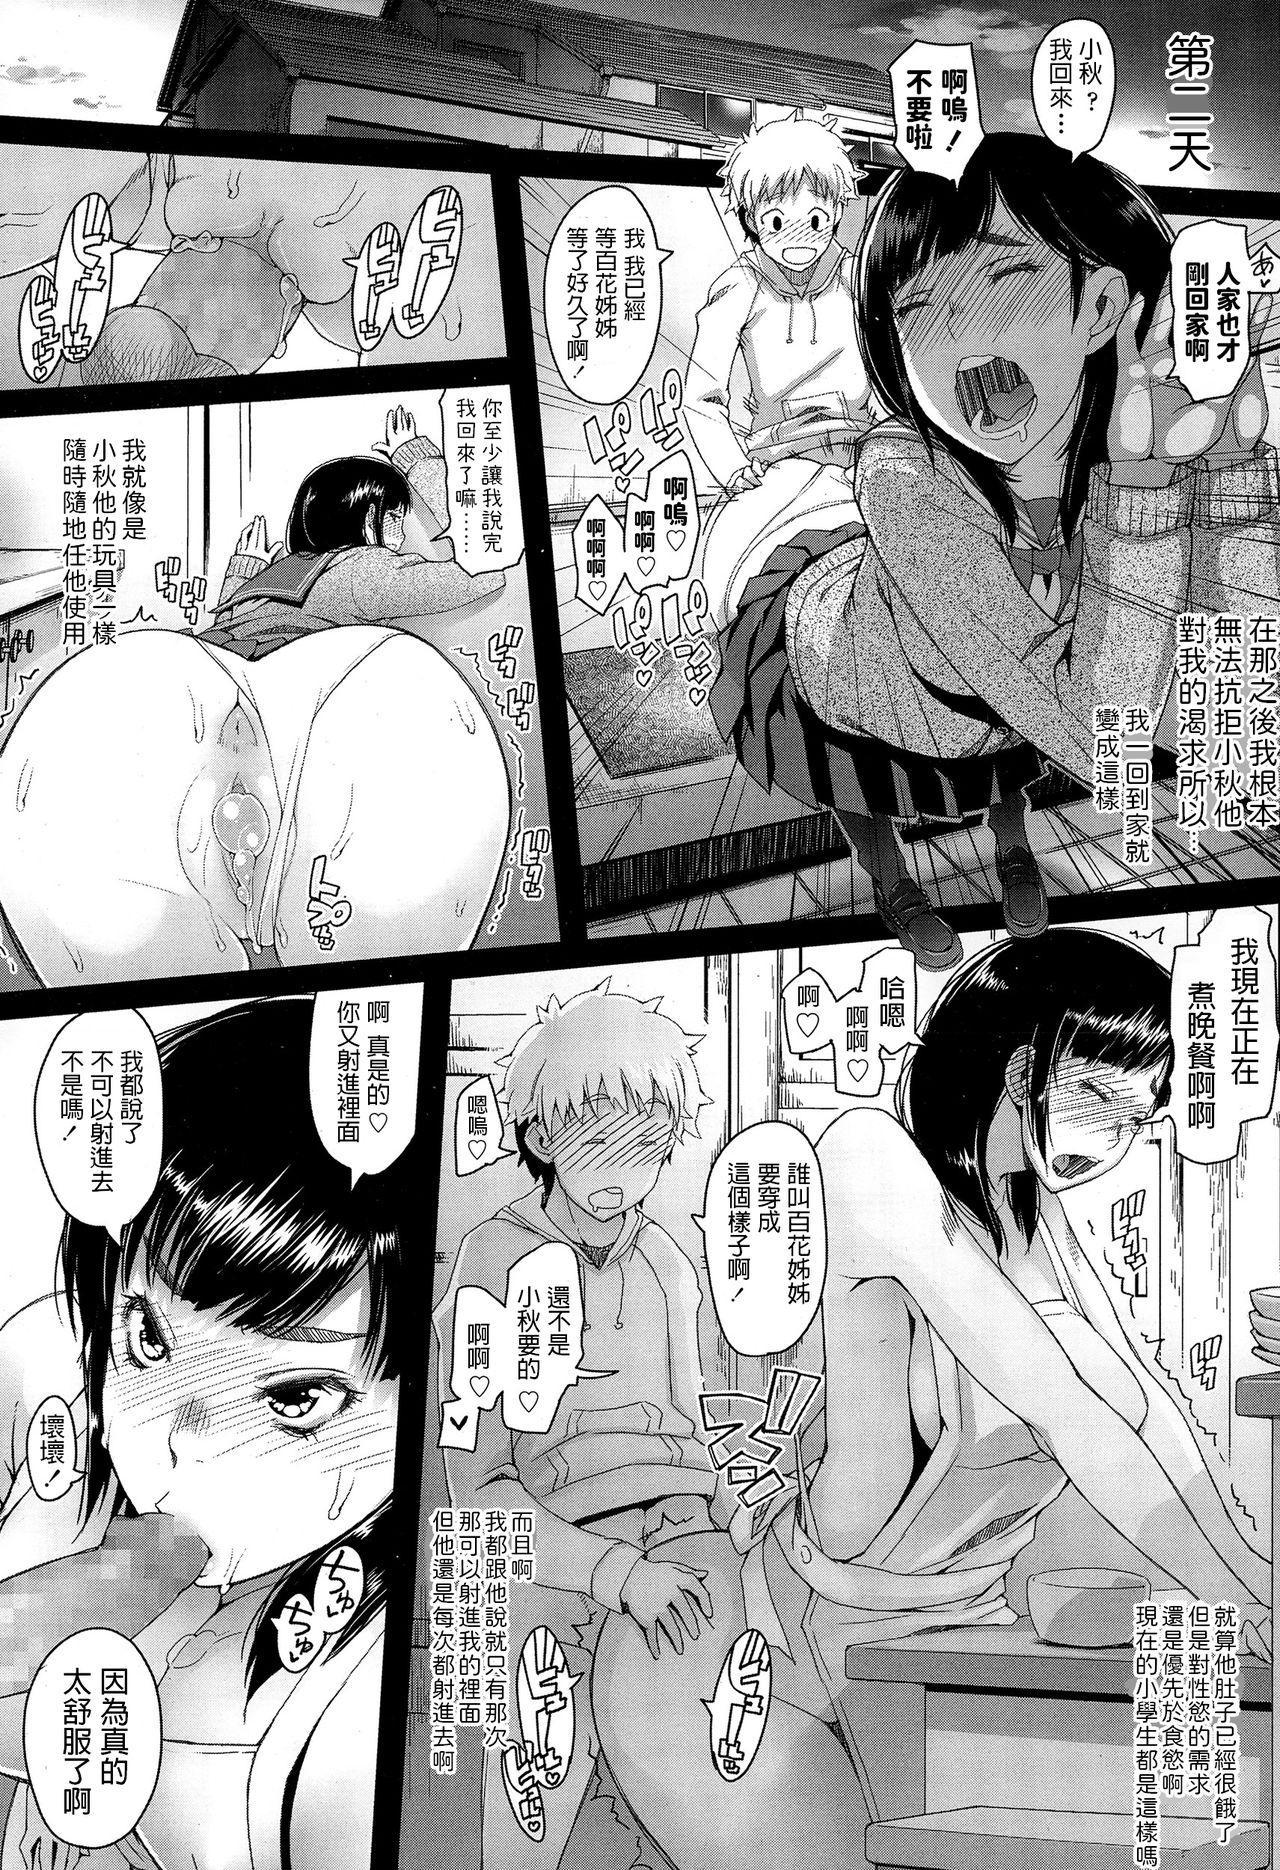 朝木貴行   女子高生のお留守番  COMIC 高 Vol.4  中文翻譯 15